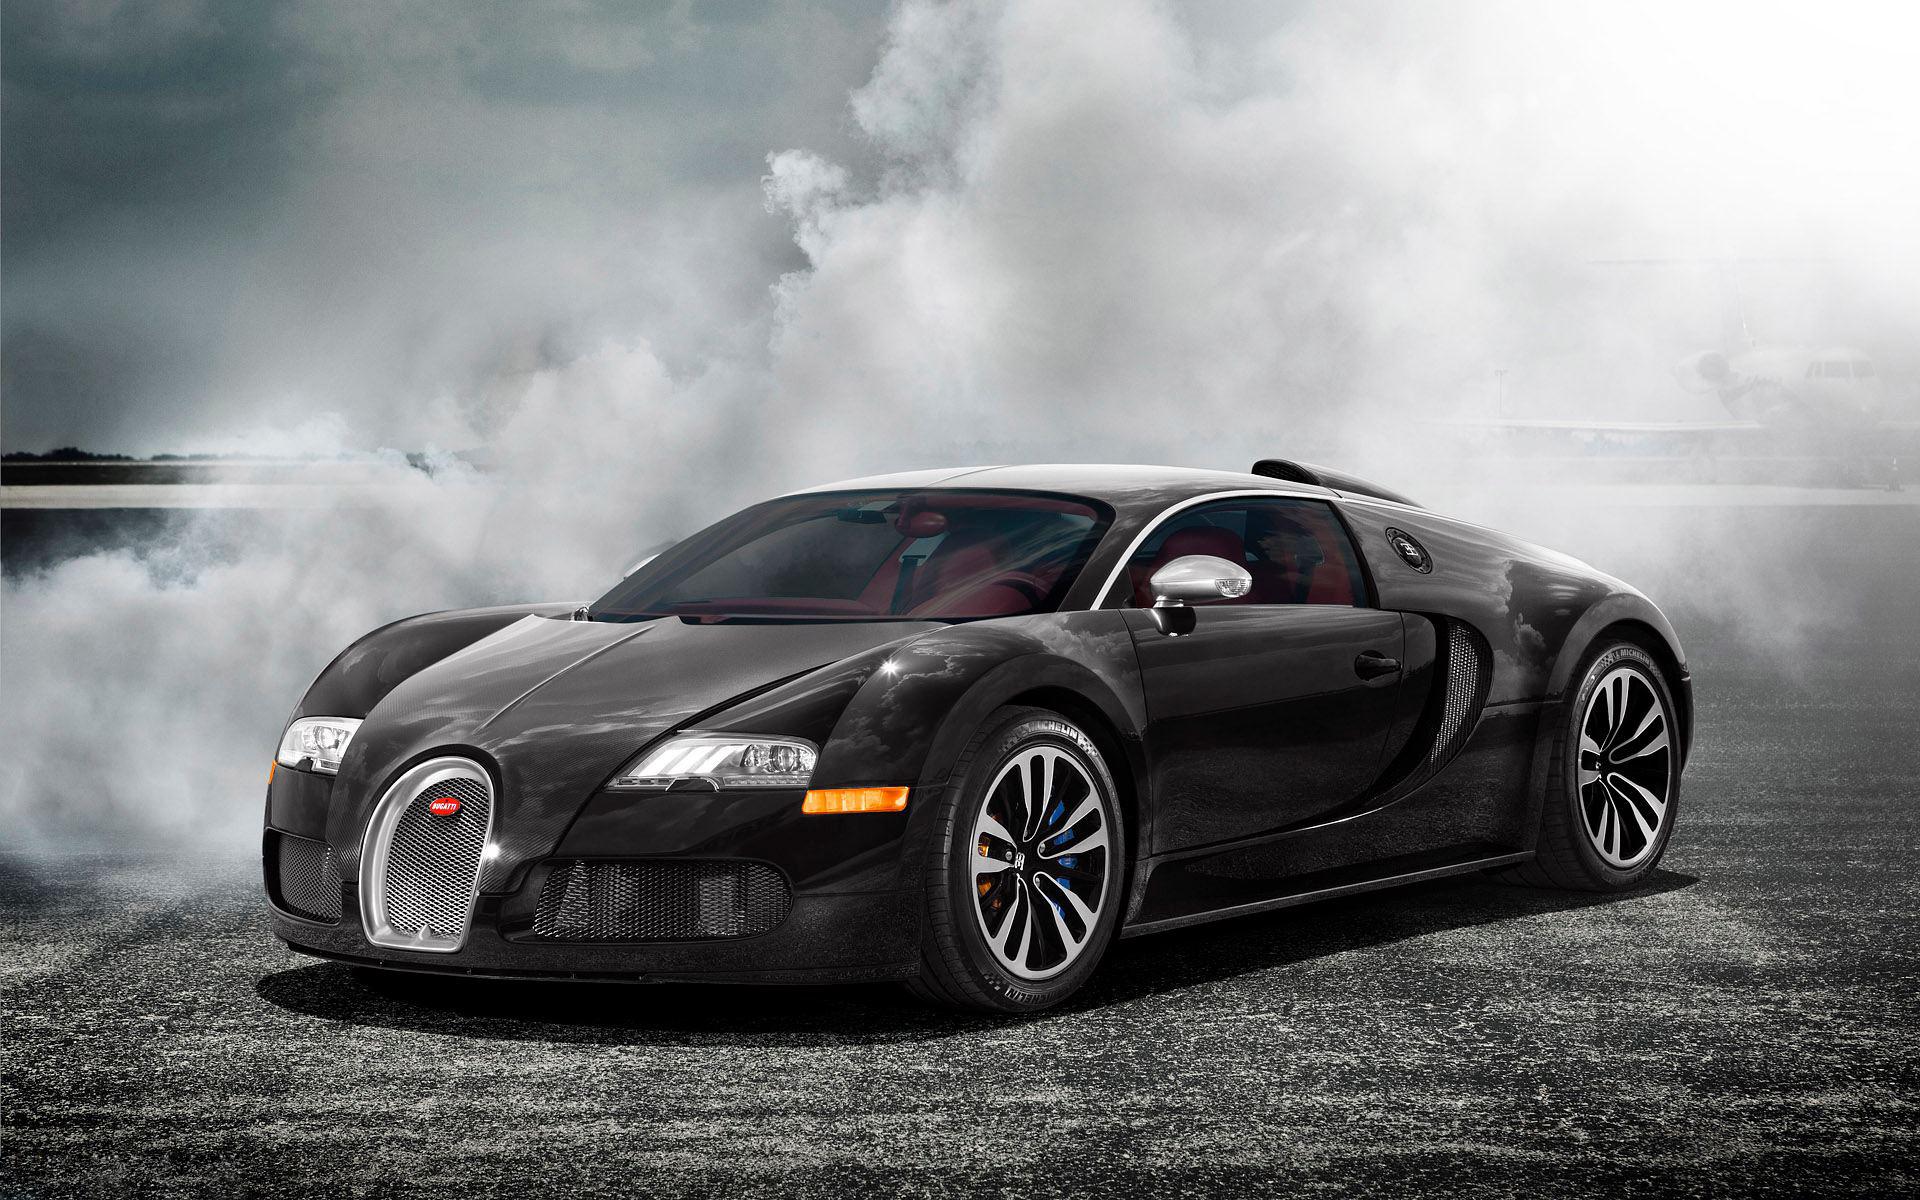 Bugatti Veyron Black Exclusive HD Wallpapers 2212 1920x1200